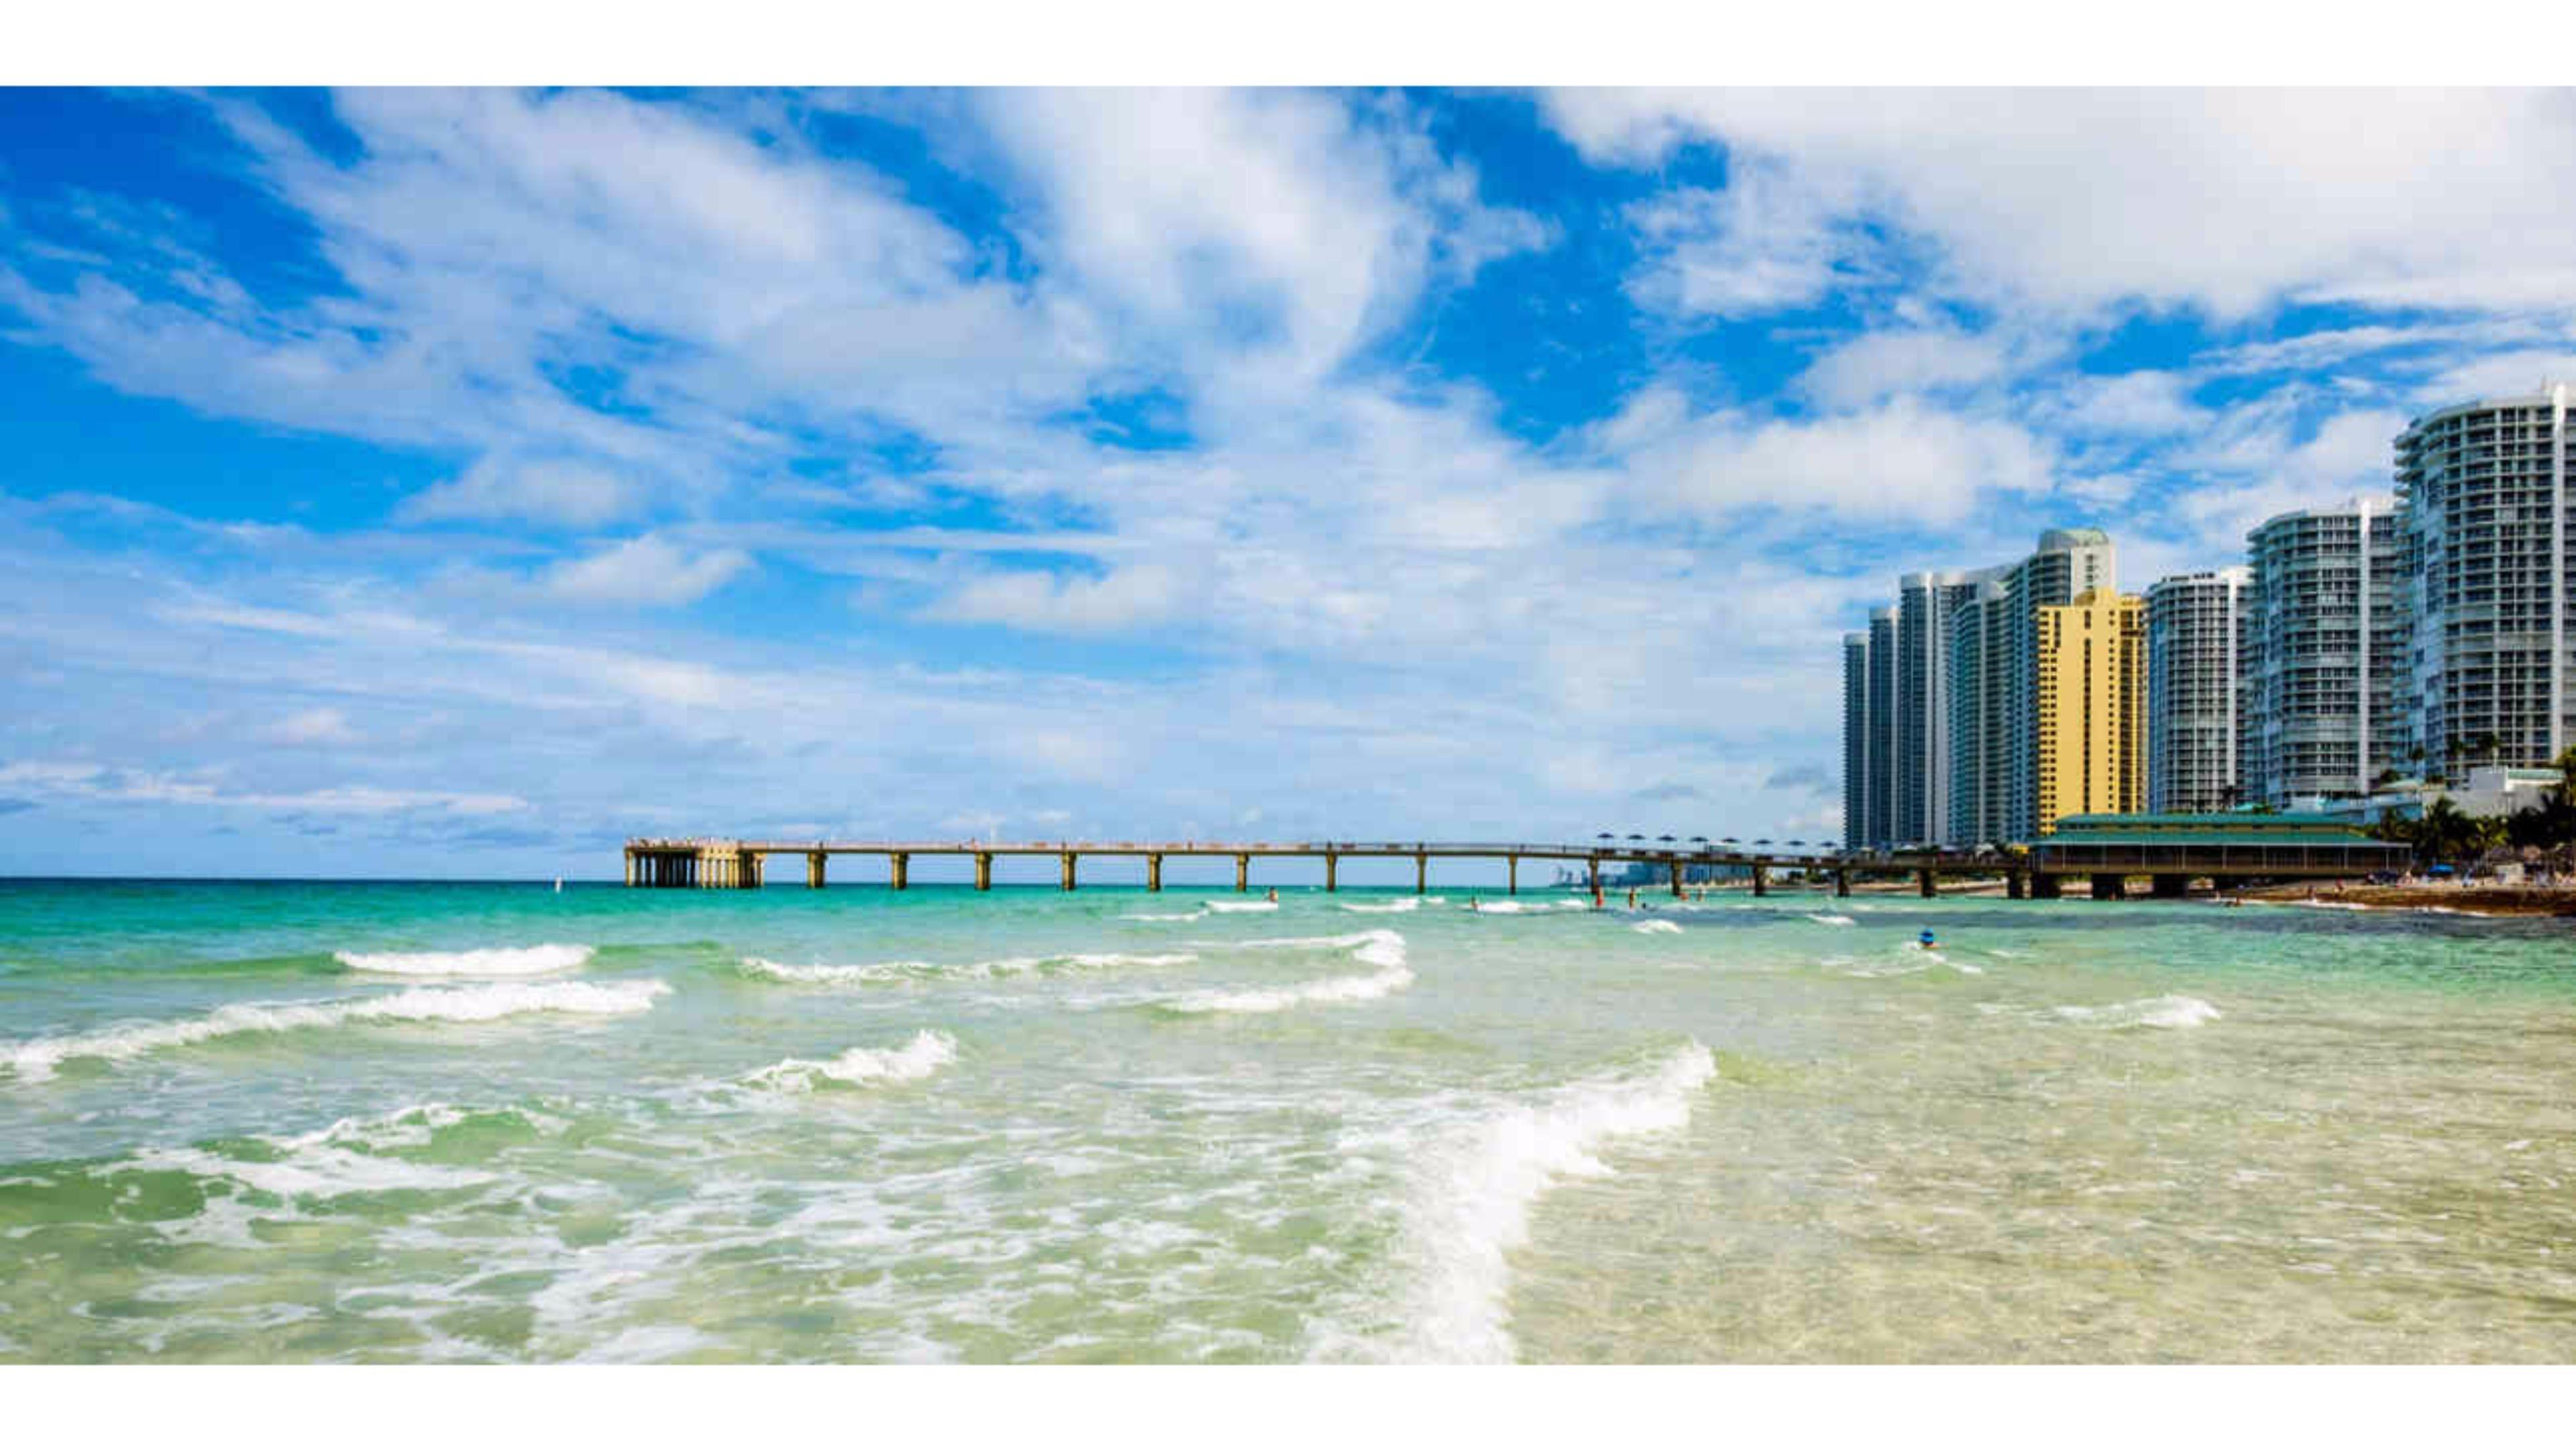 New South Beach 2016 Miami Florida 4K Wallpaper